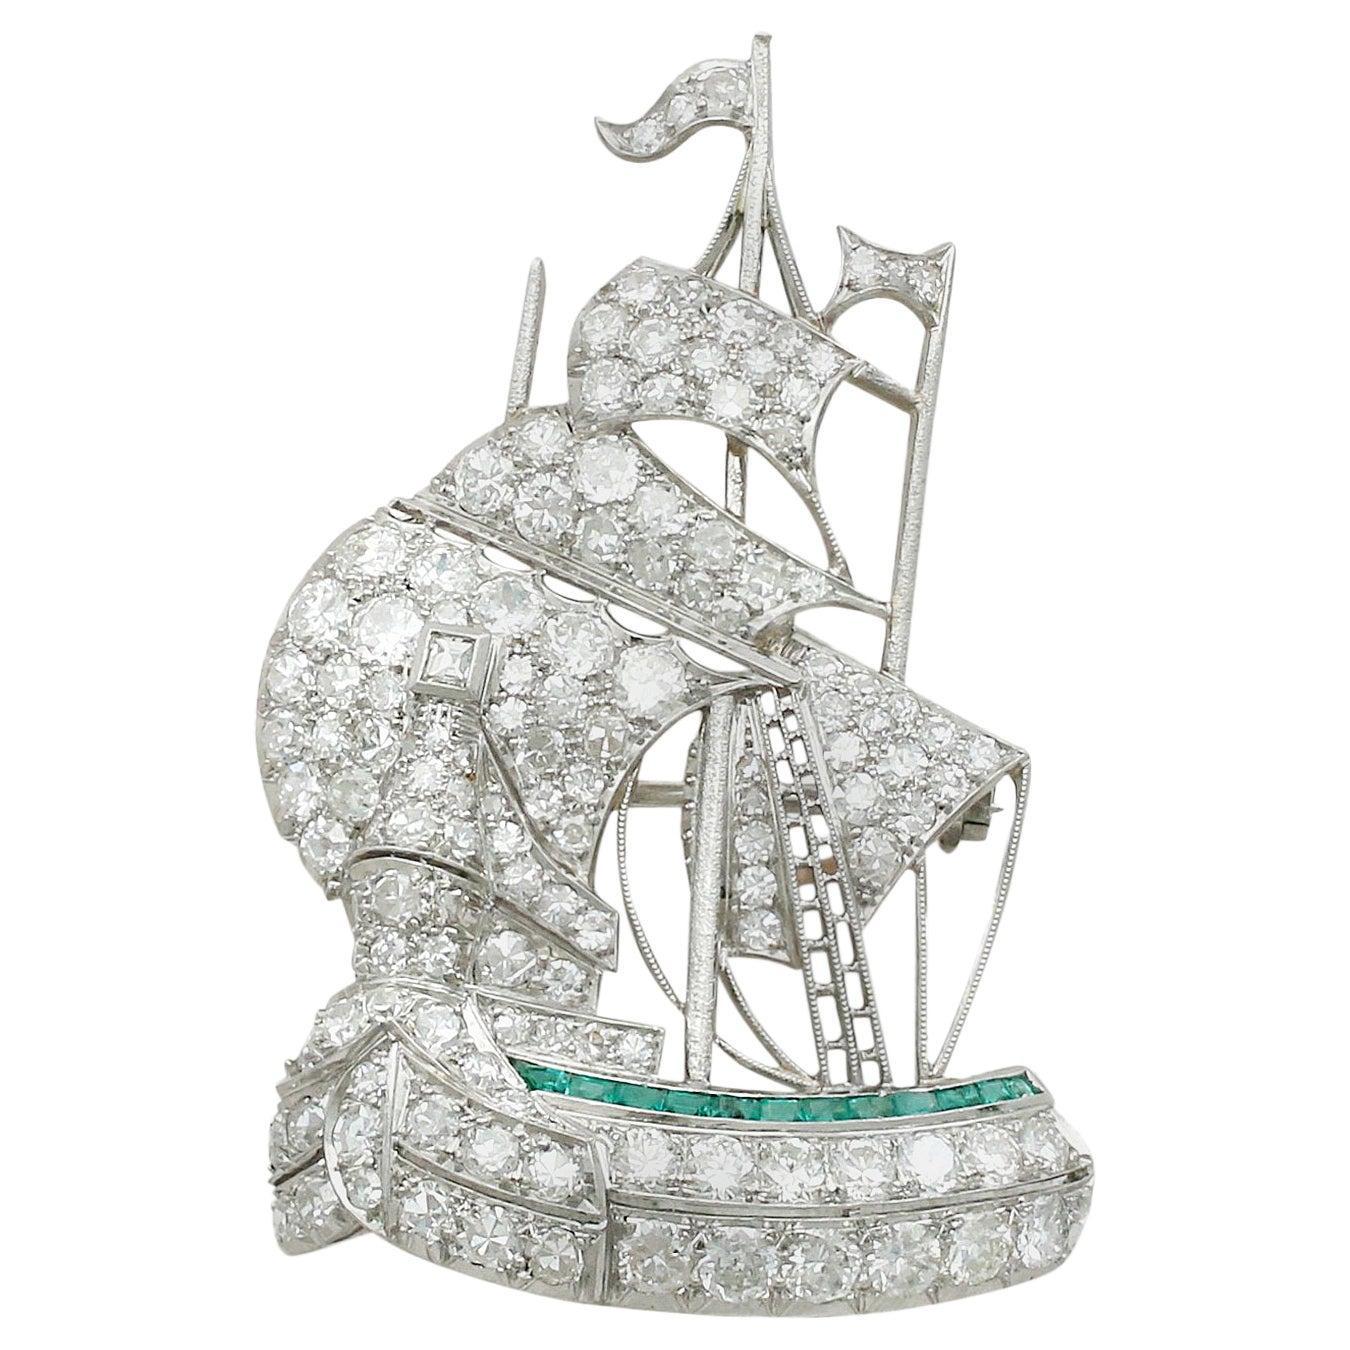 Antique 1910s Diamond and Emerald Platinum Galleon Ship Brooch